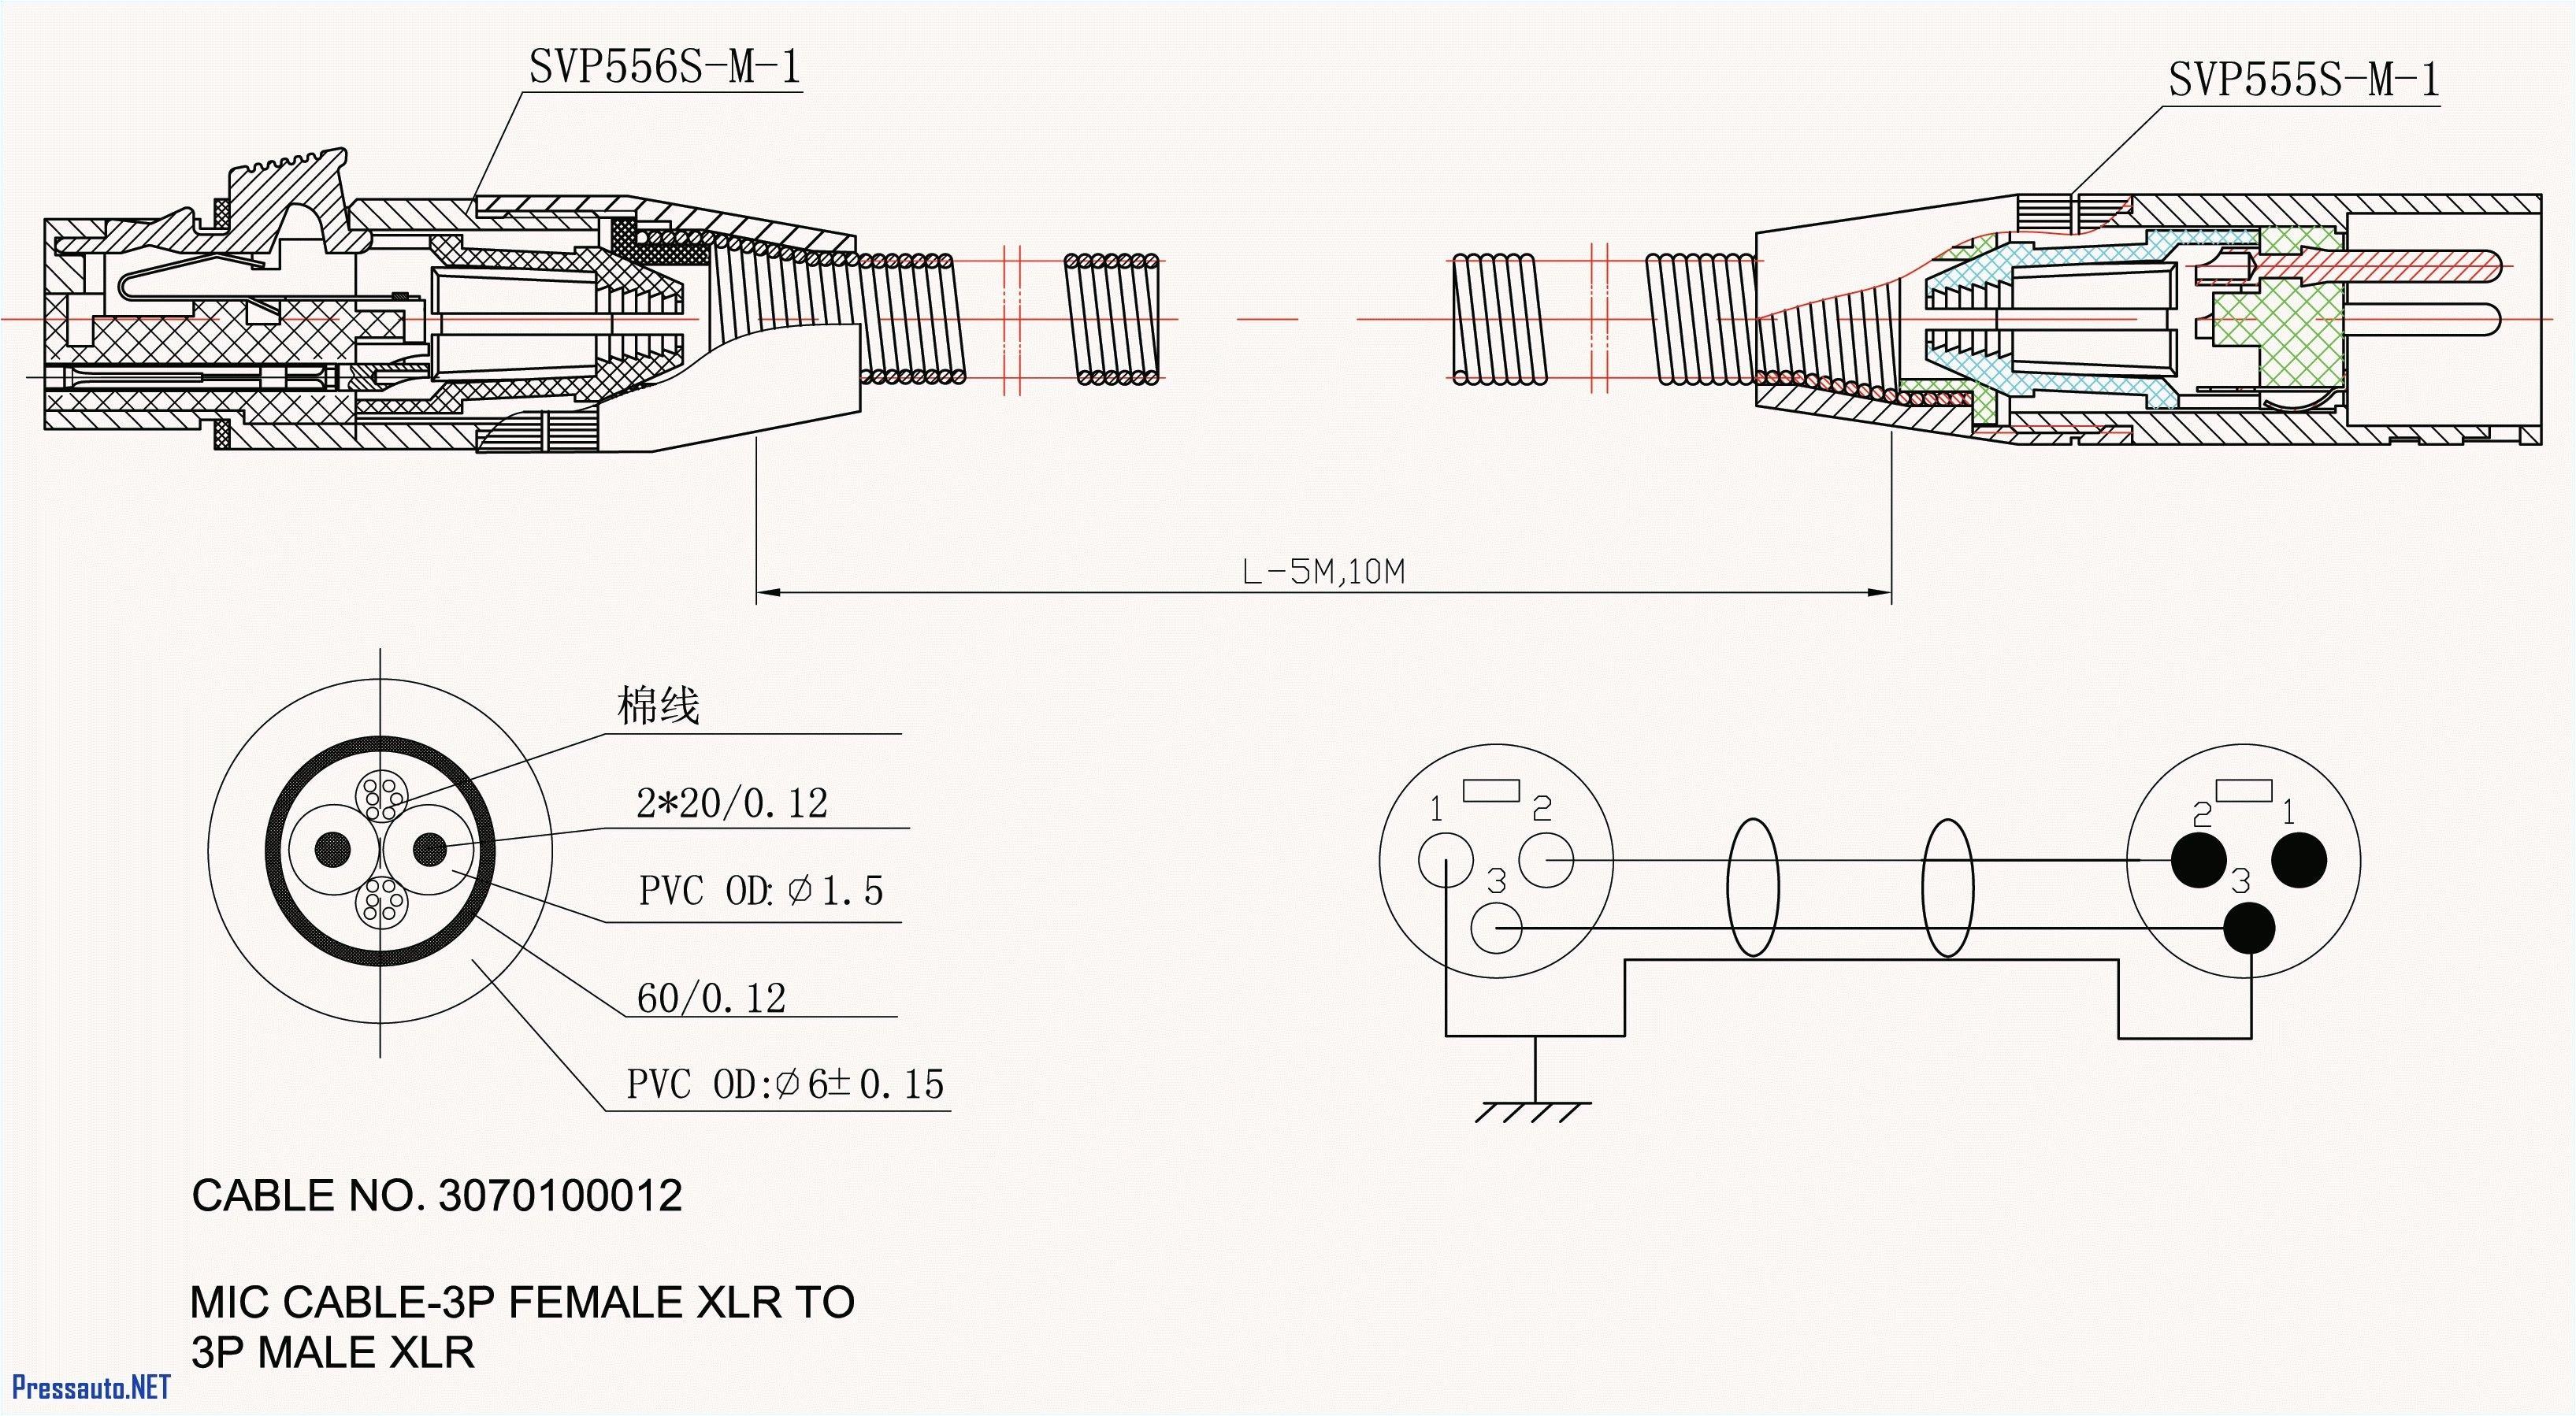 wiring diagram guitar jack save xlr to mono jack wiring diagram in xlr to mono jack